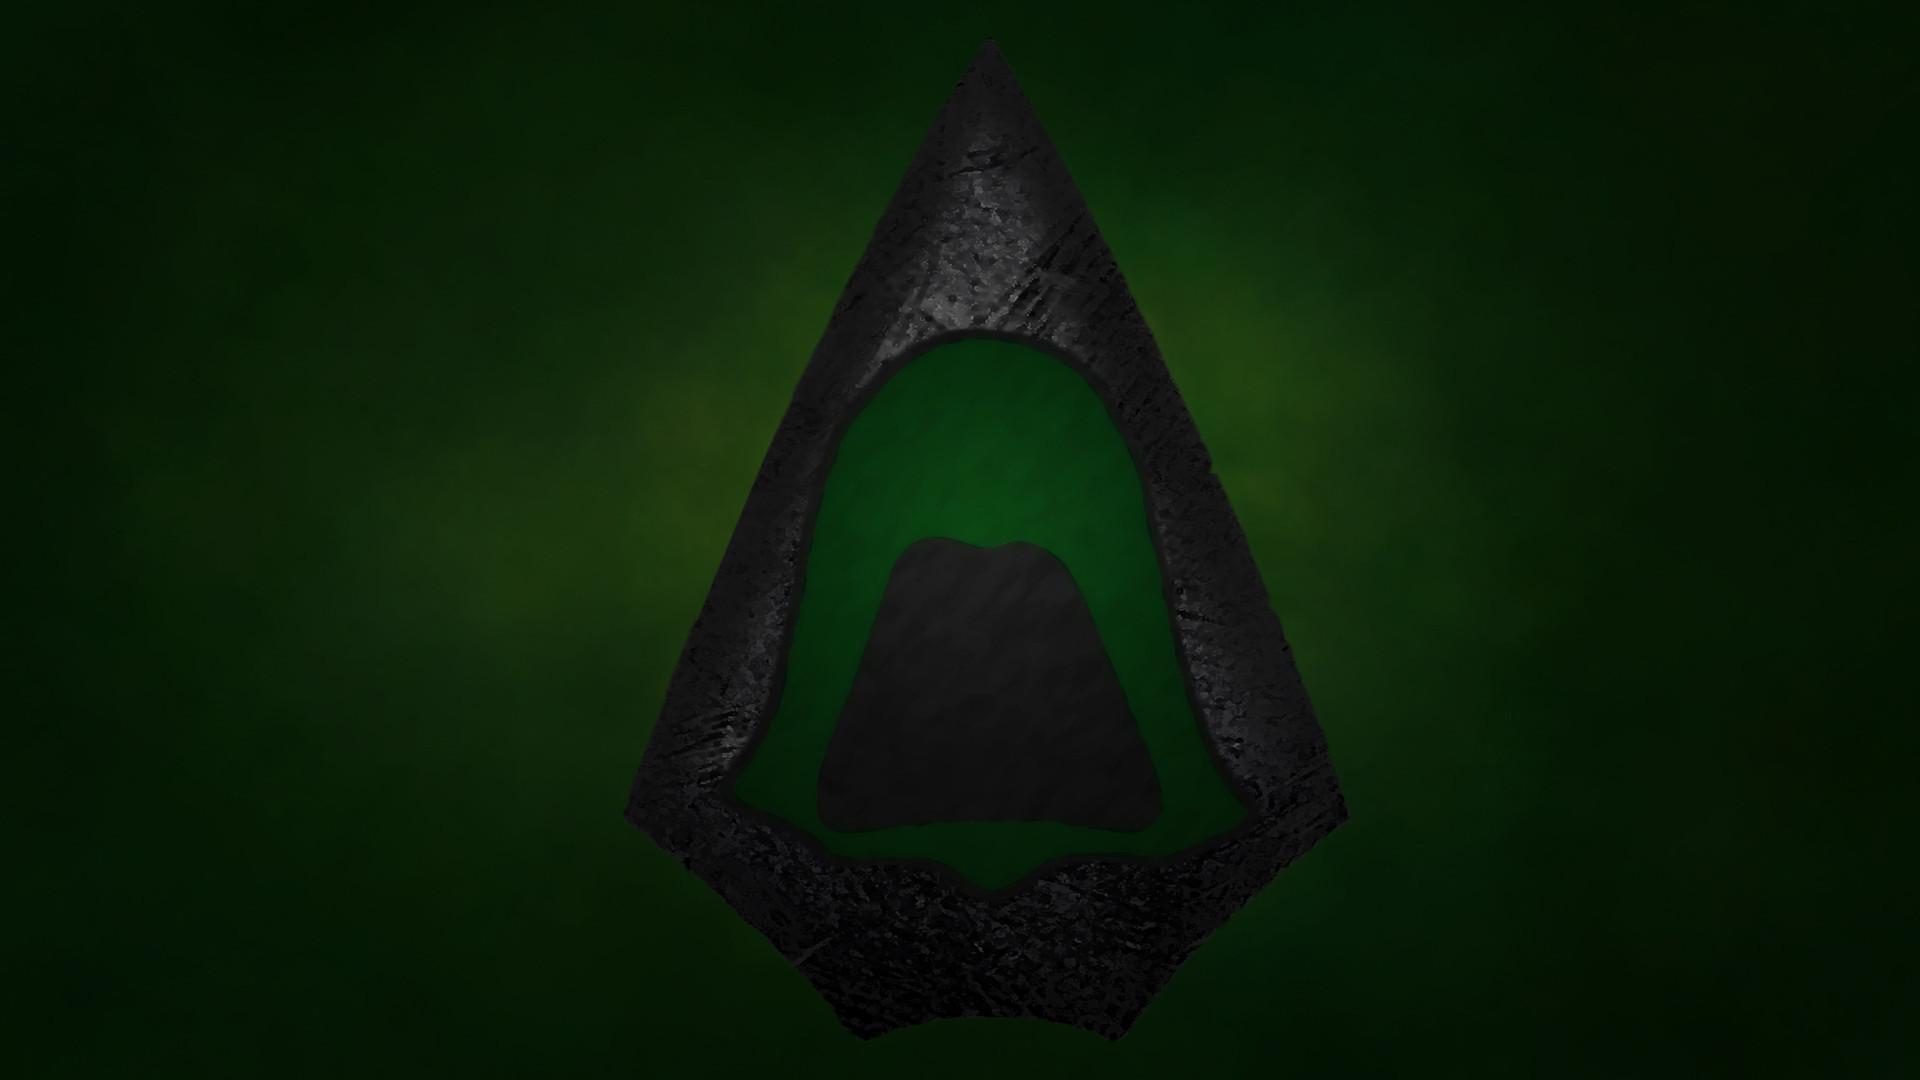 Green Arrow Wallpaper Simplistic Ish 1920x1080 Imgur